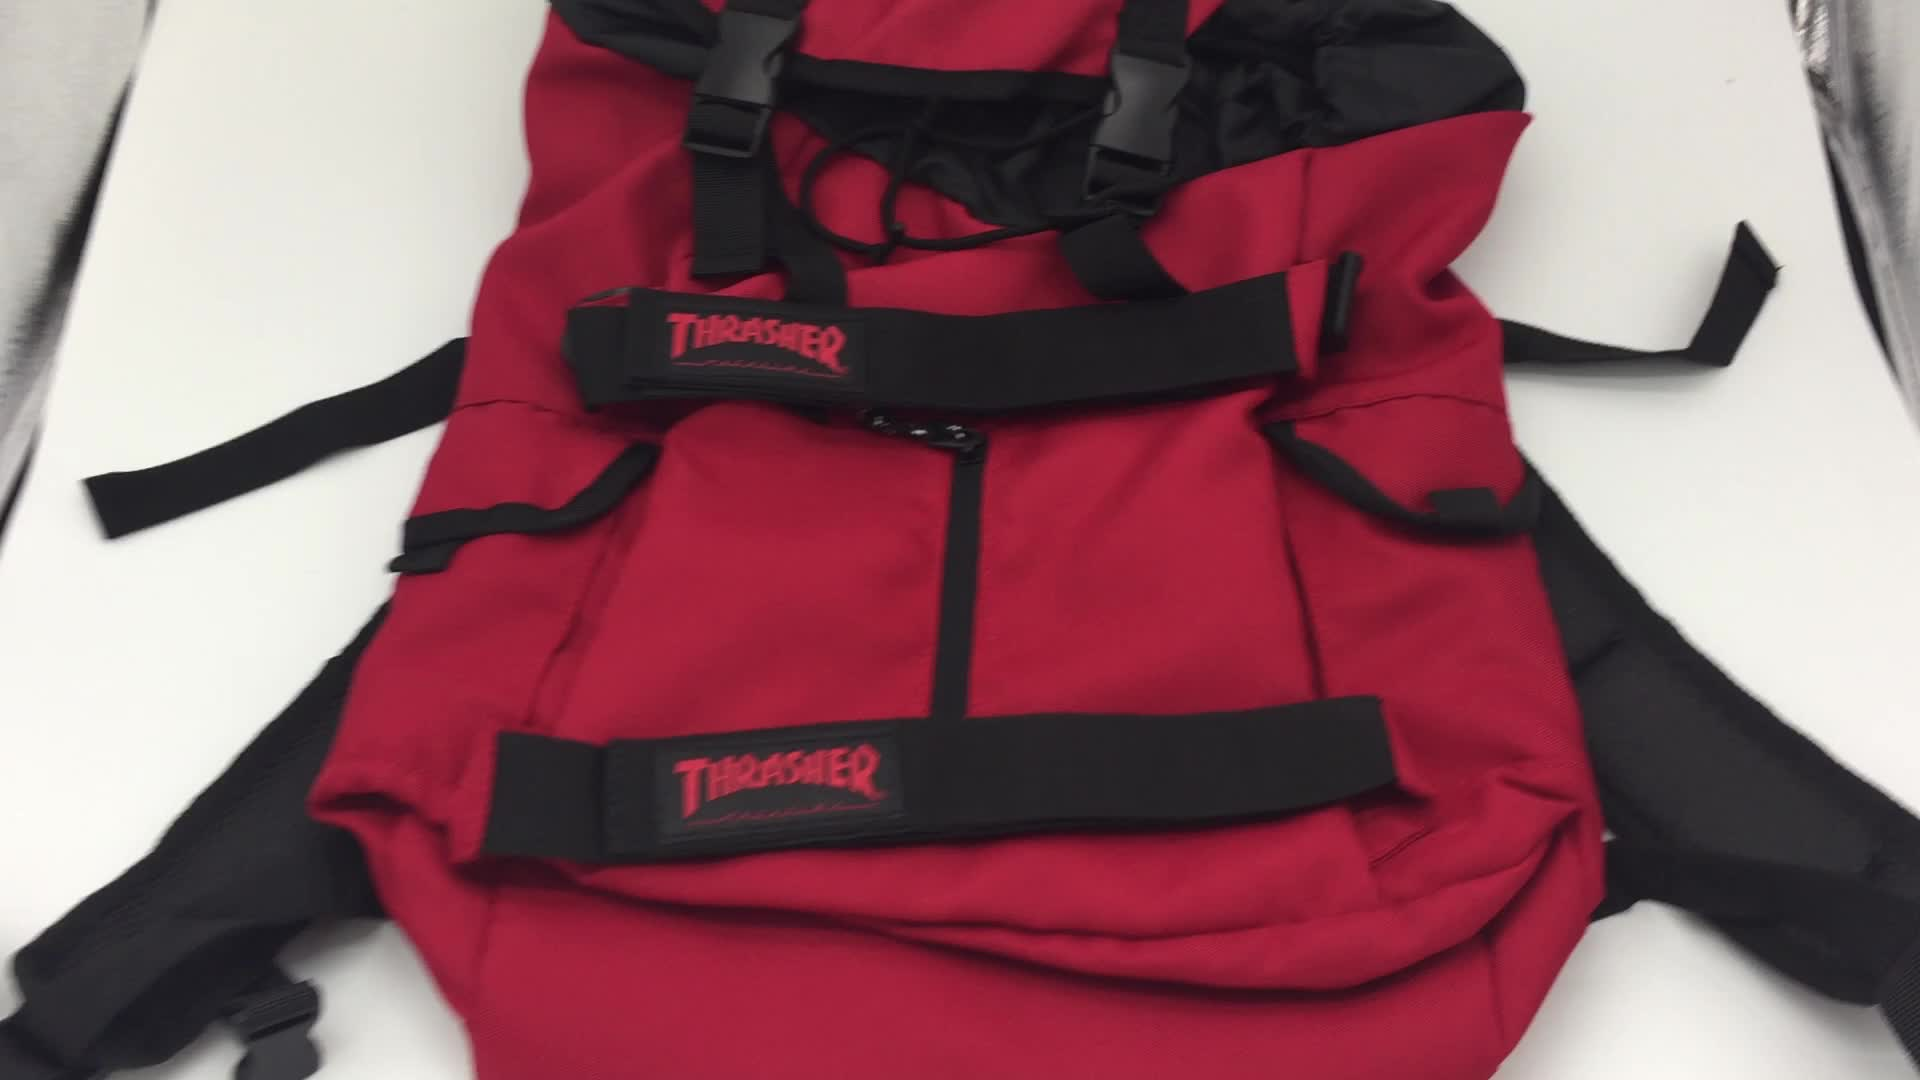 SKATERGEAR longboard กระเป๋าเป้สะพายหลังกระเป๋าสเก็ตบอร์ด